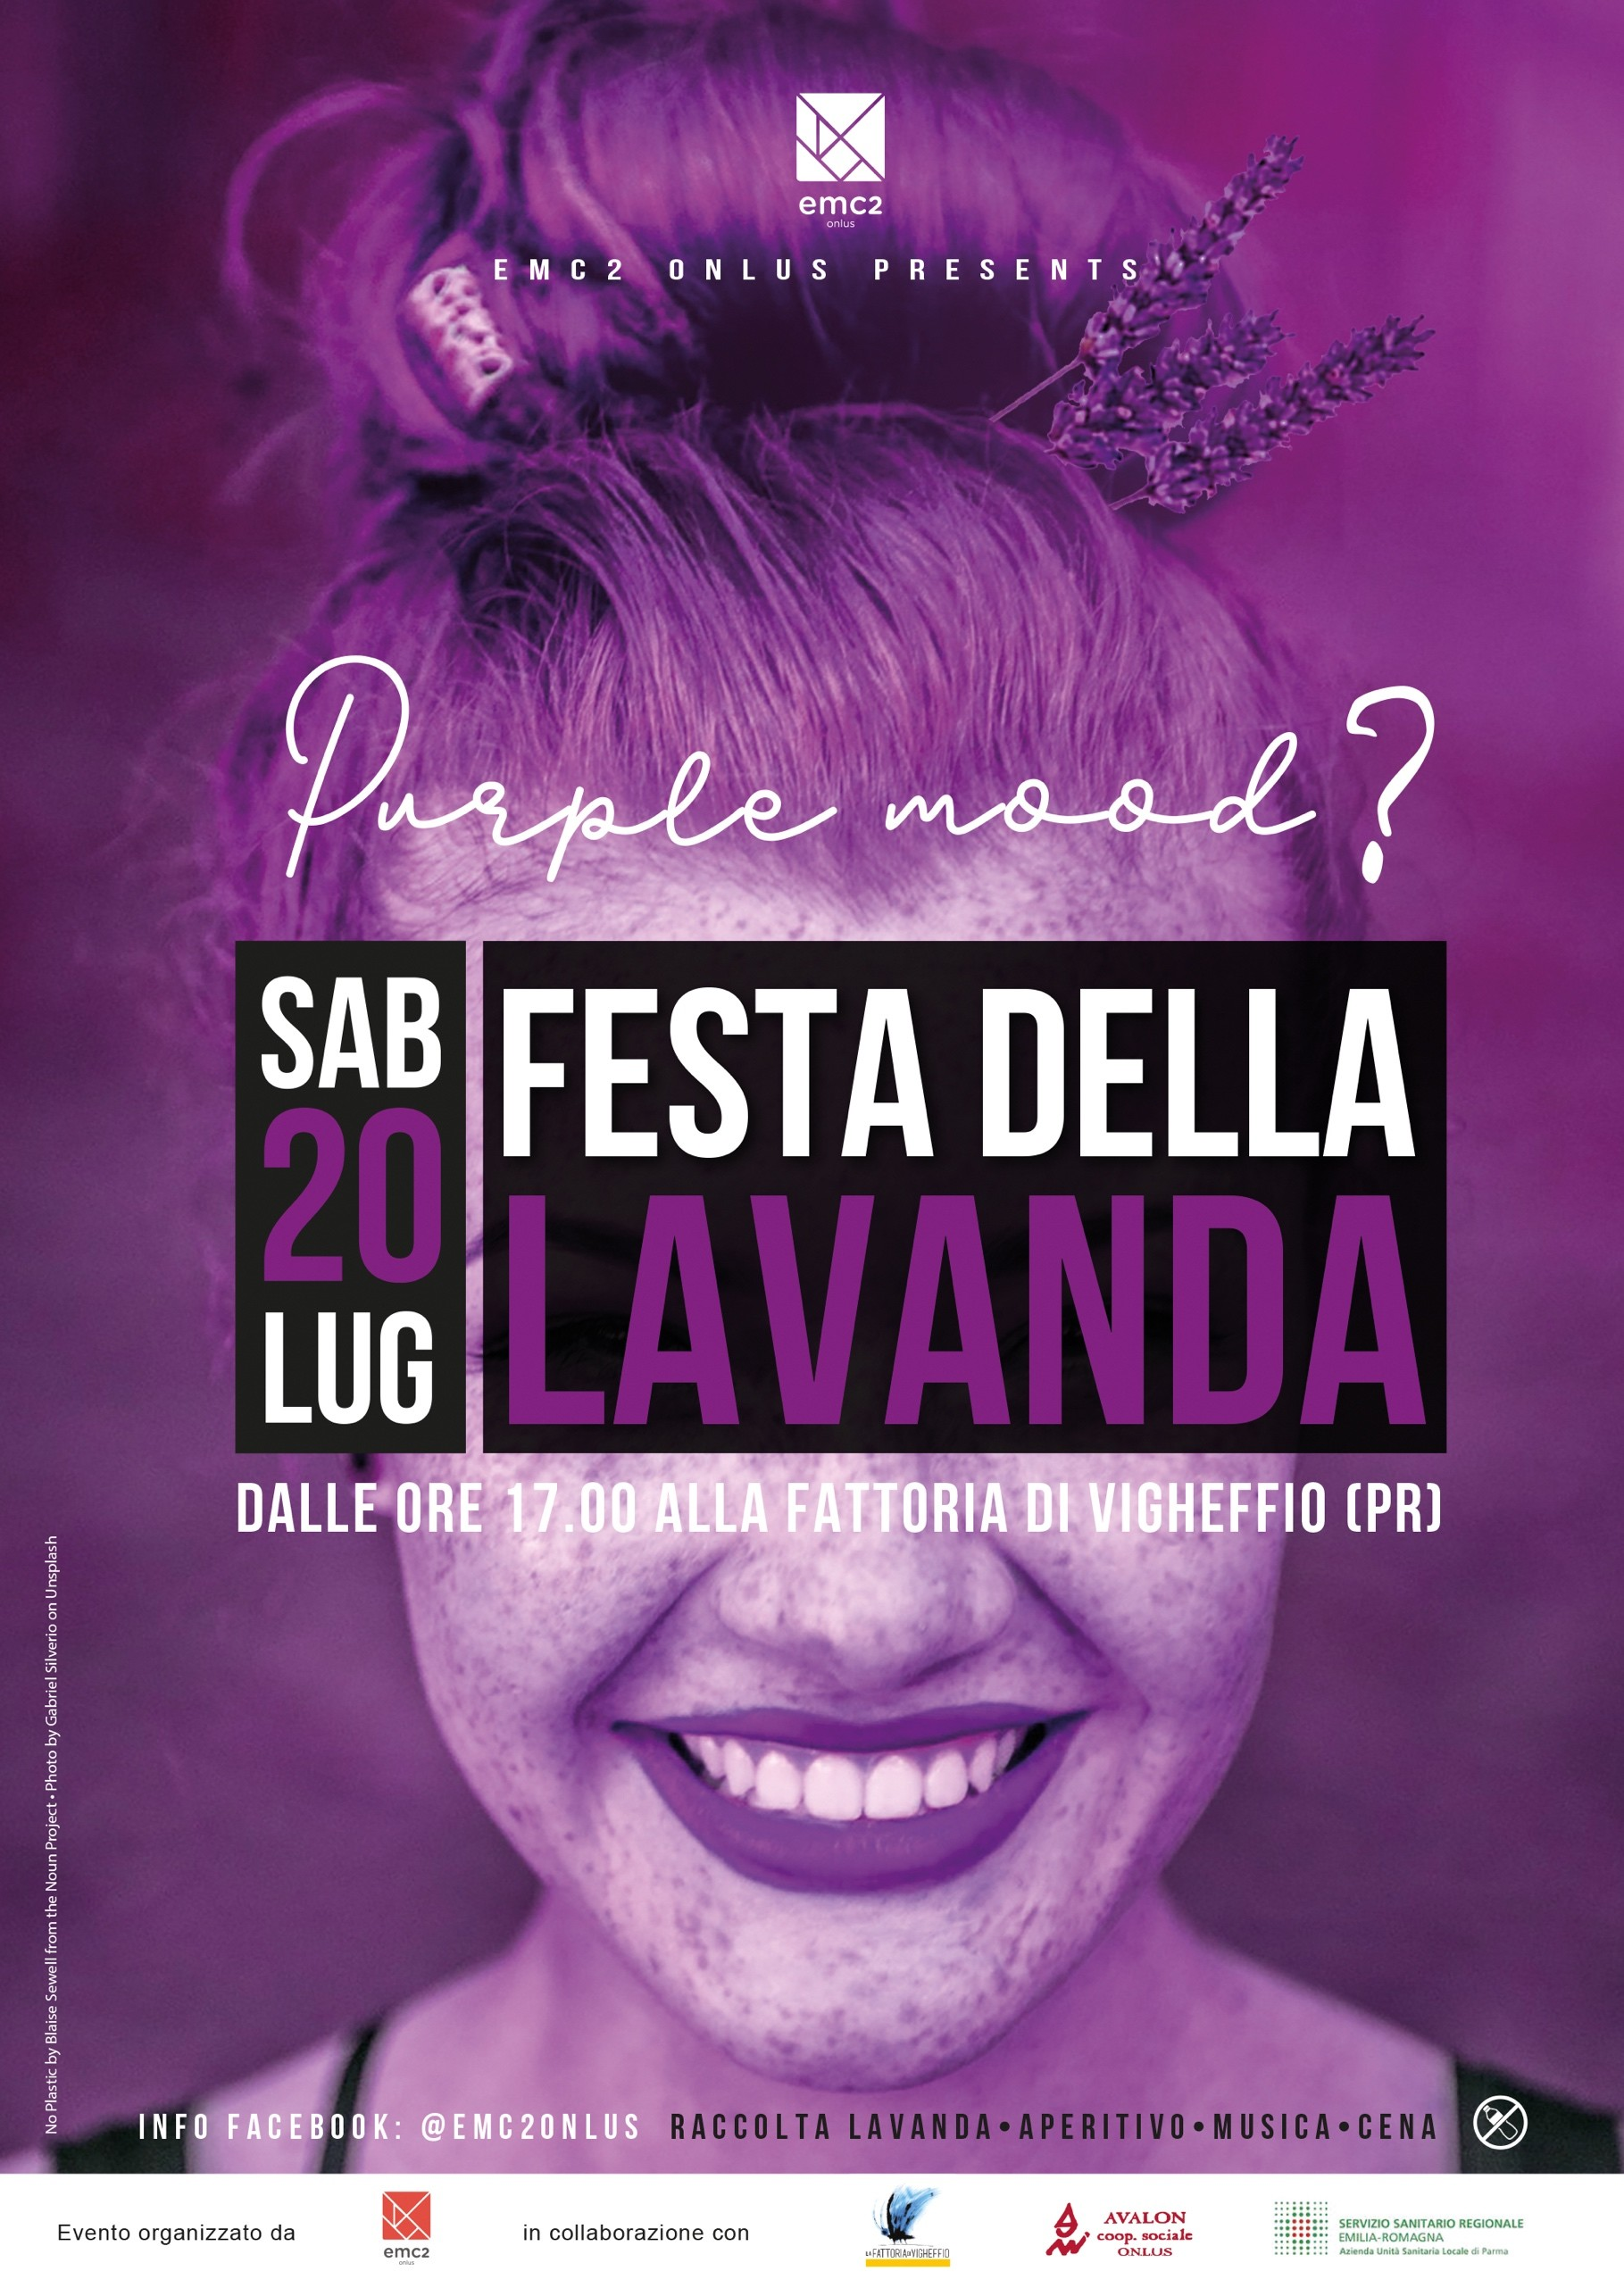 FESTA DELLA LAVANDA 2019